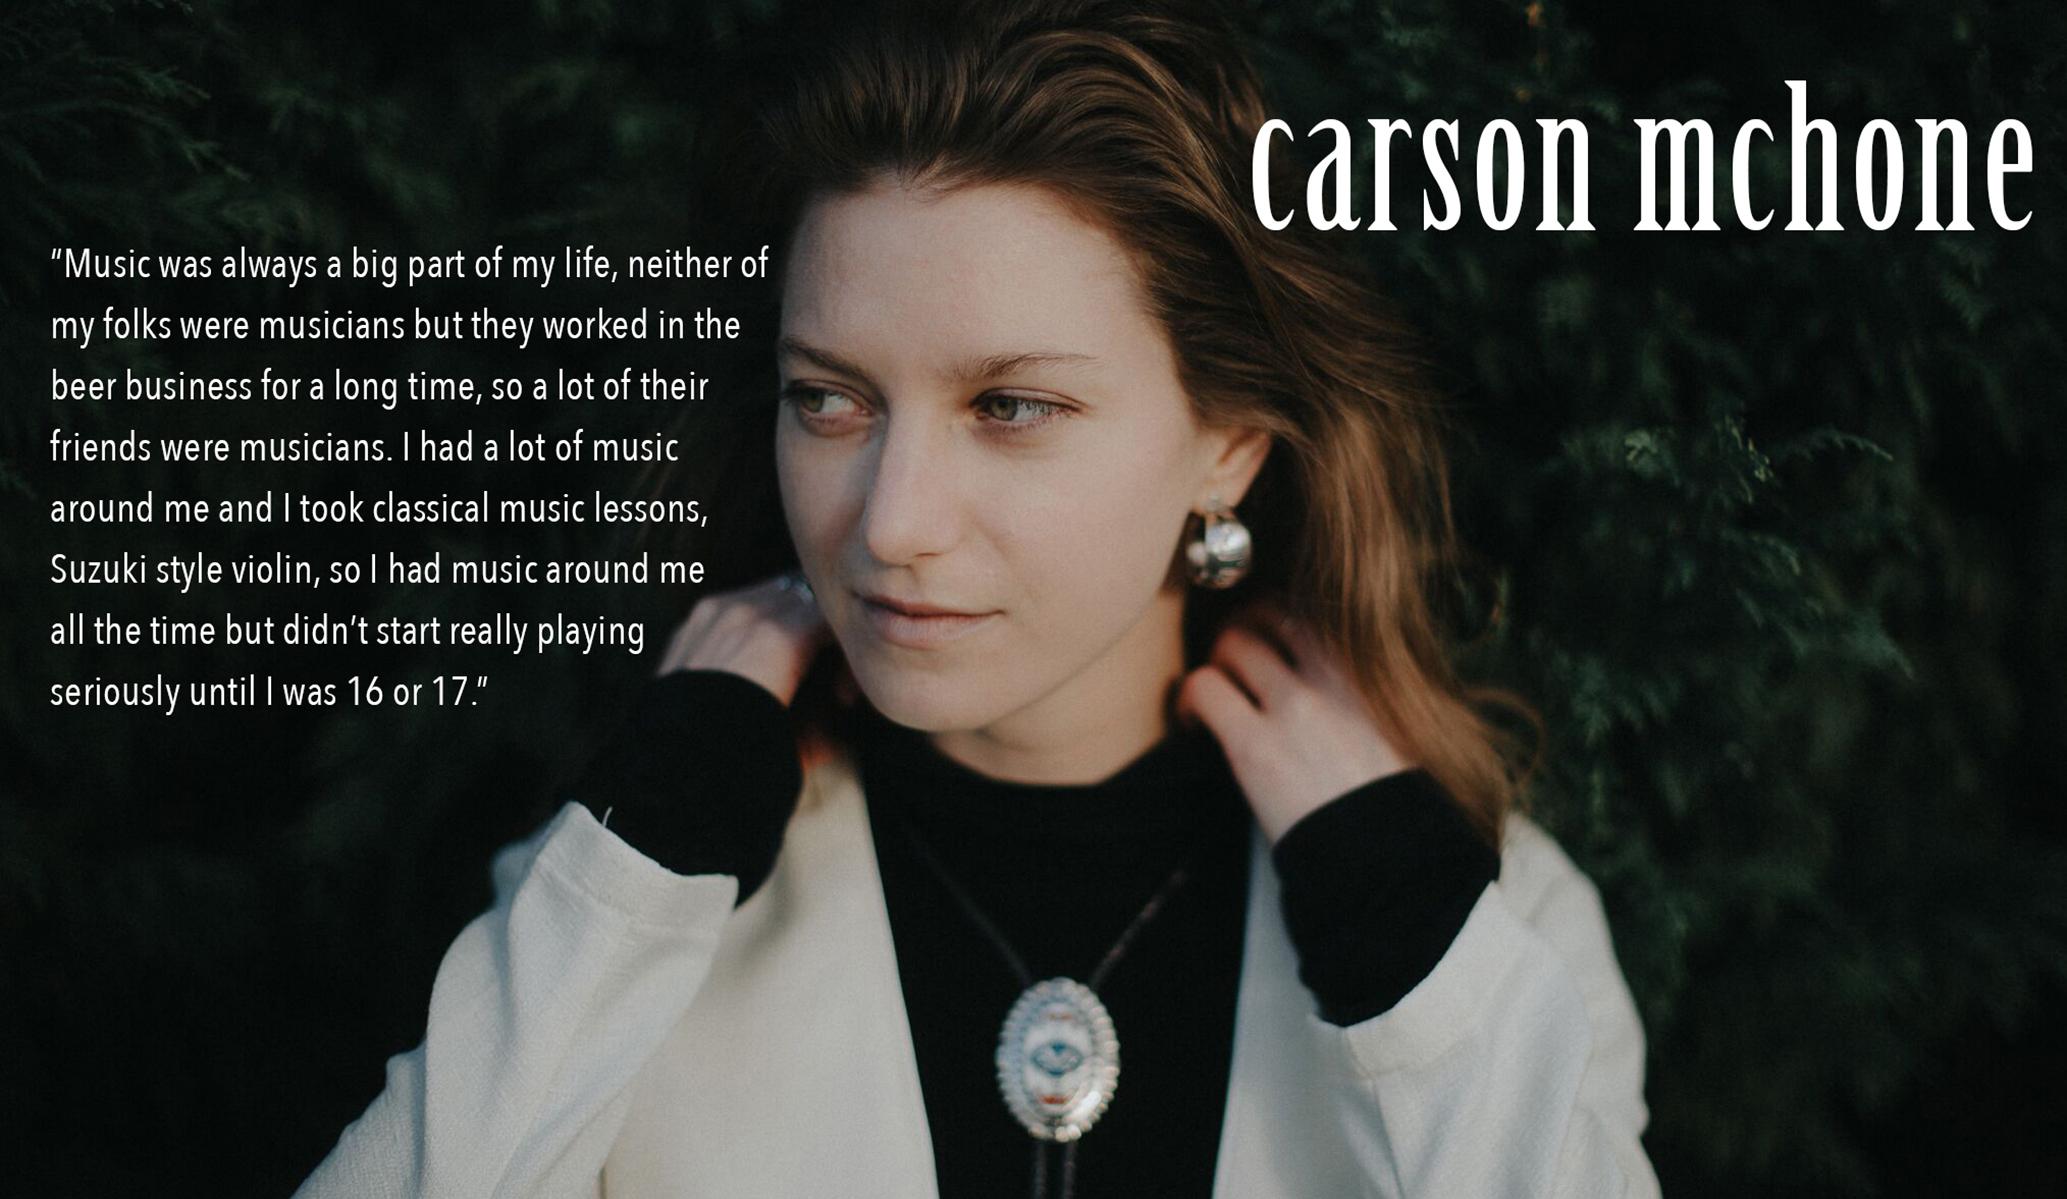 Photograph courtesy of carsonmchonemusic.com